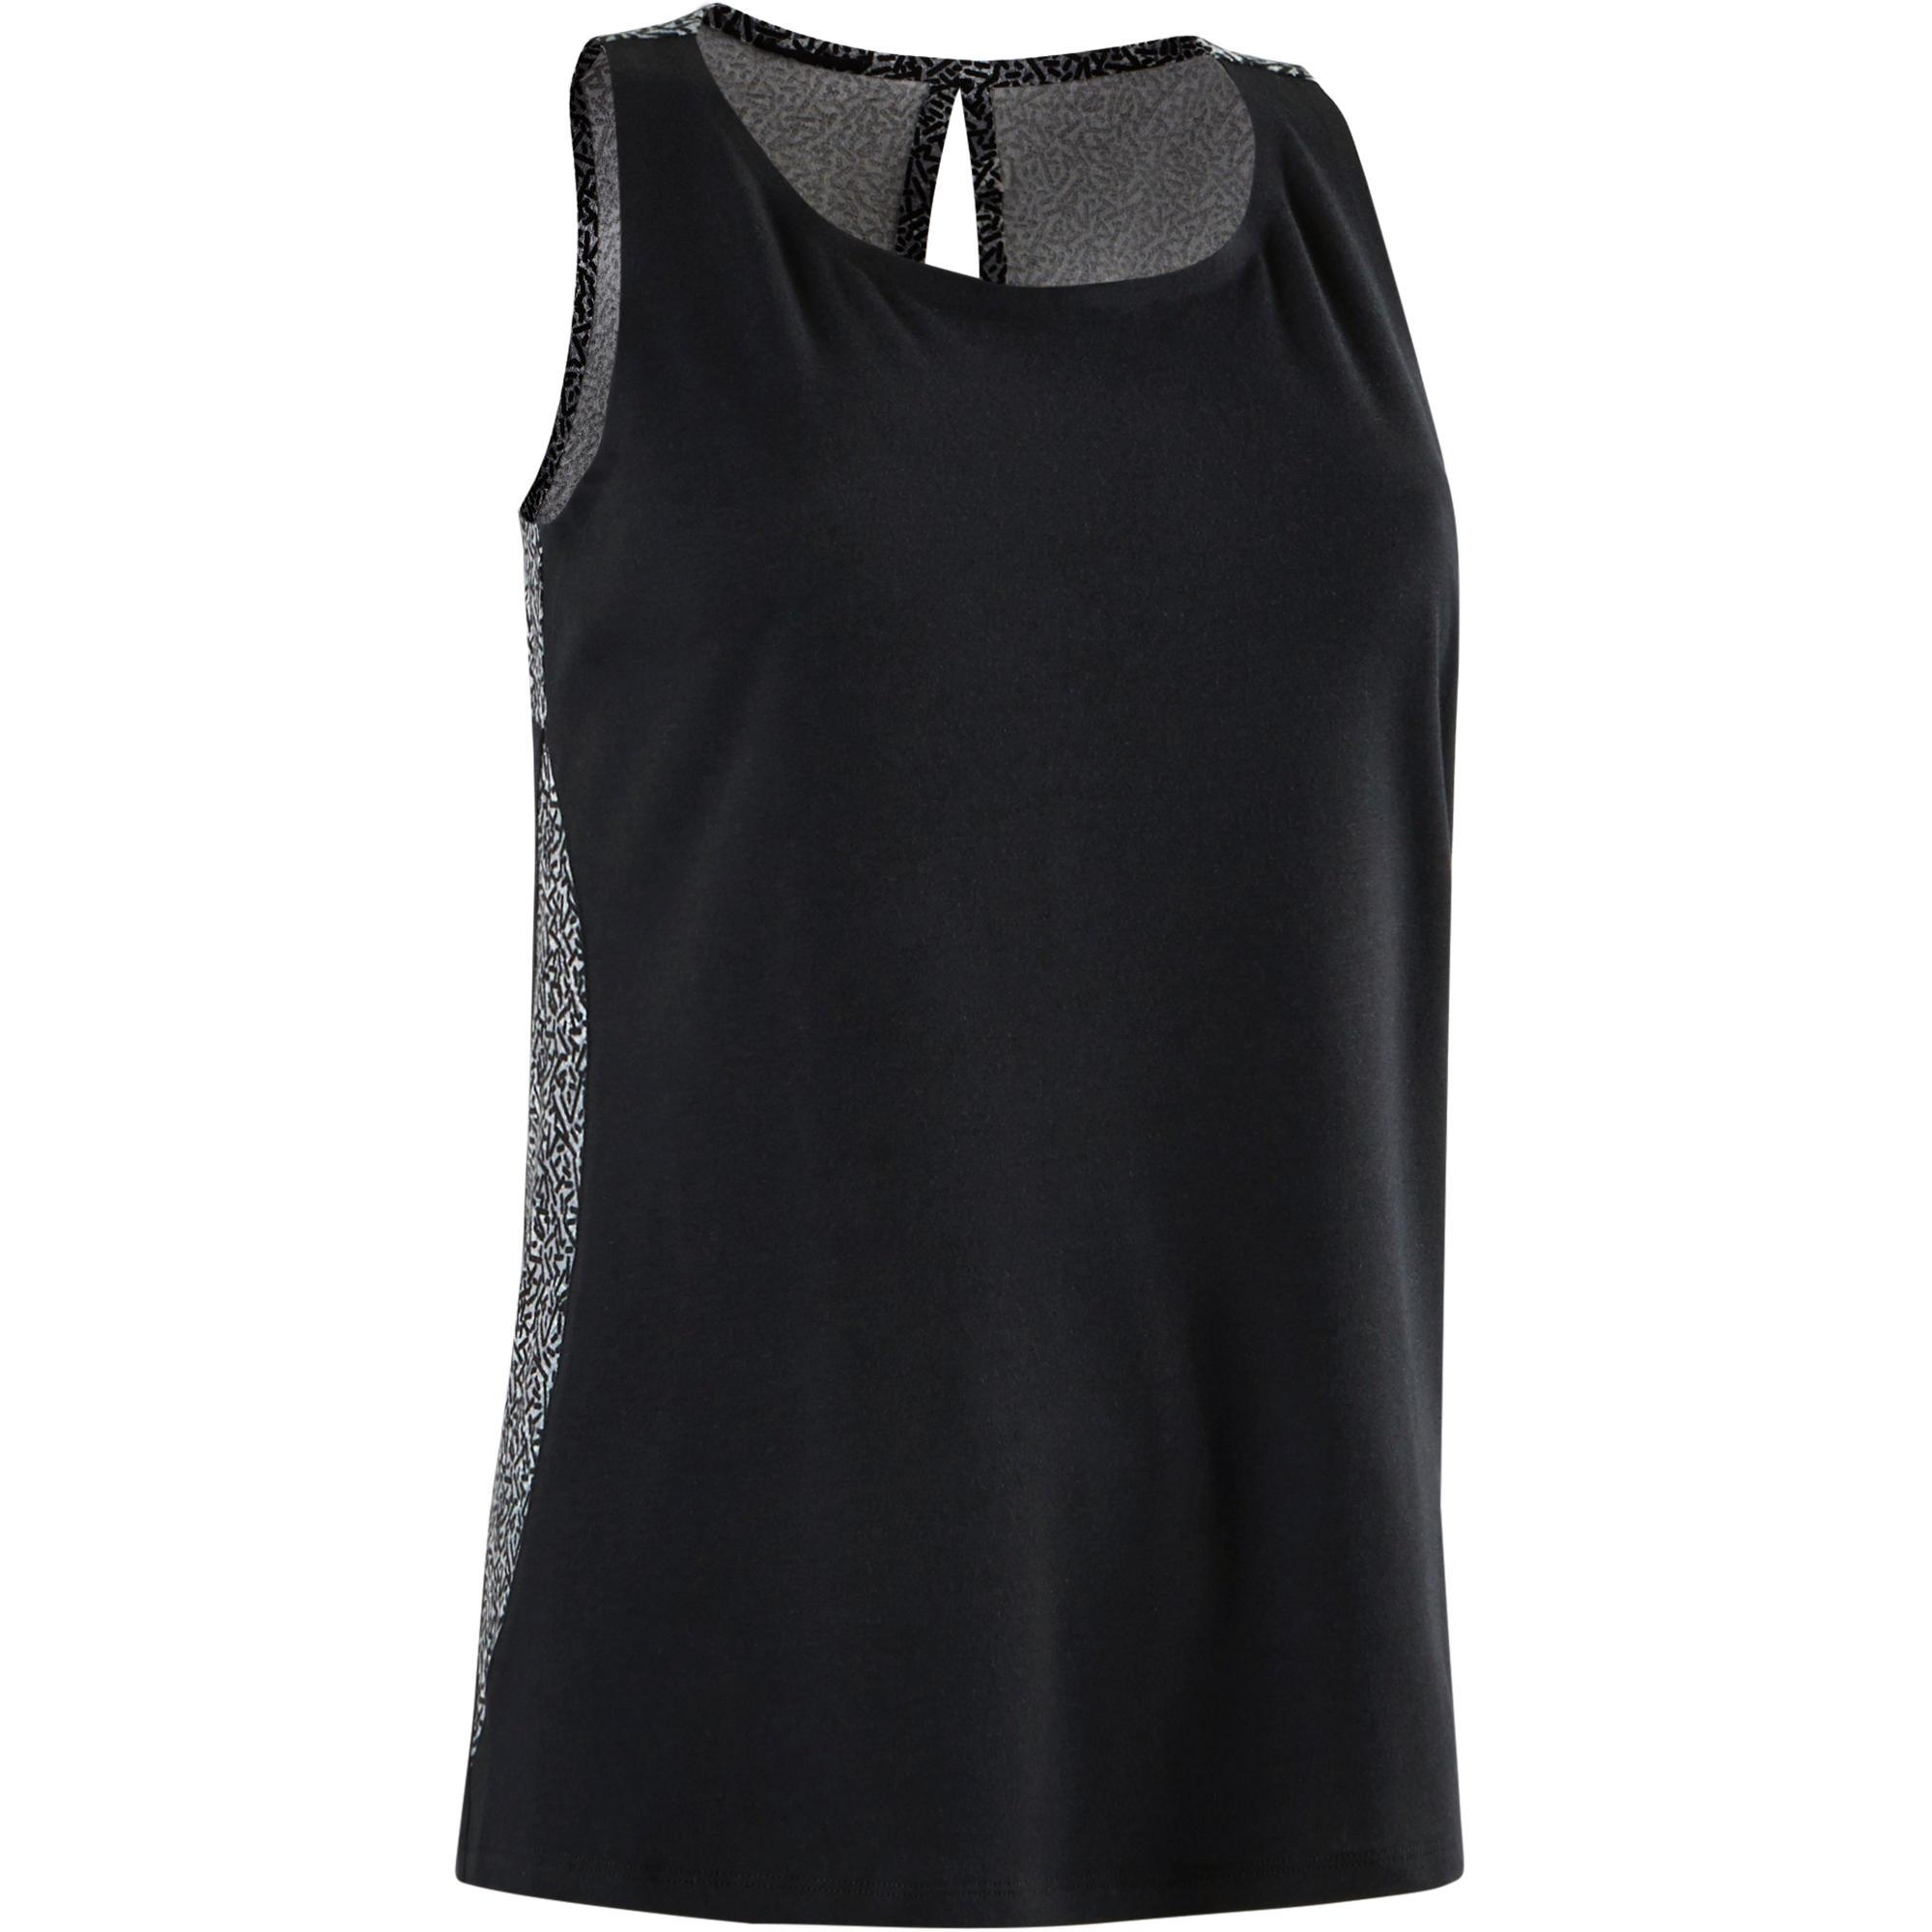 Camiseta sin mangas 520 Pilates y Gimnasia suave mujer negro